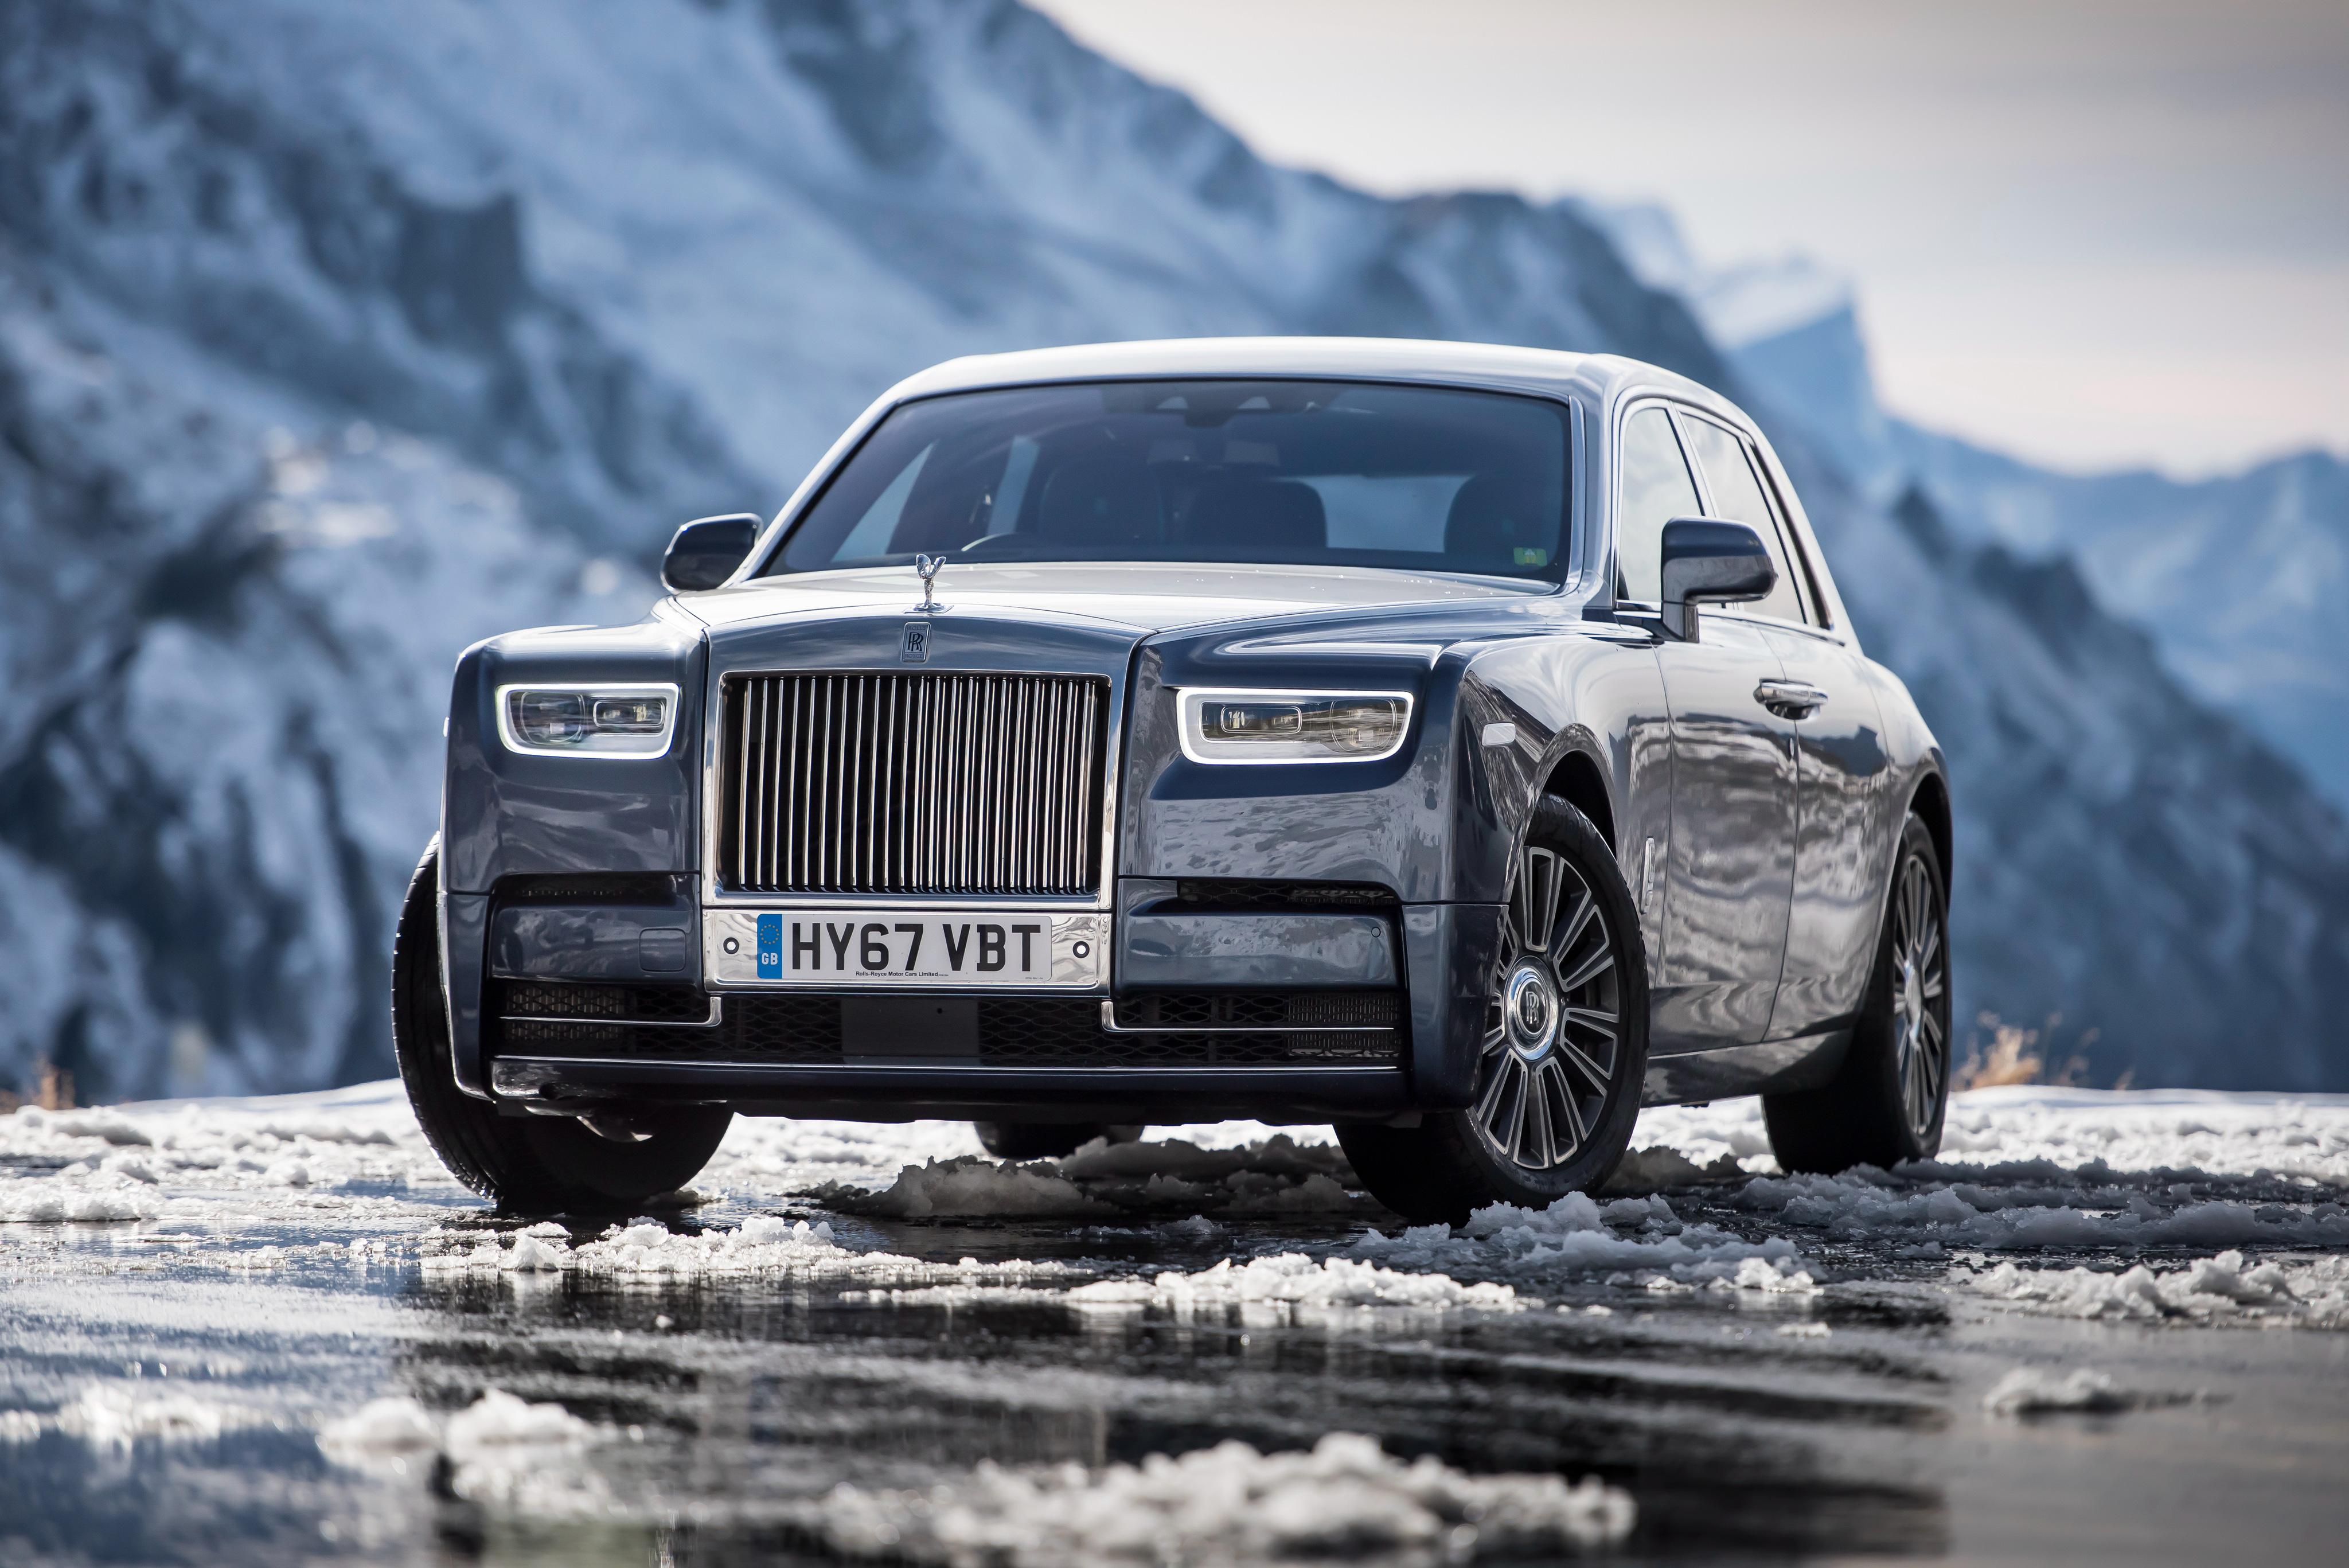 Rolls Royce Phantom Uk 2017 Hd Cars 4k Wallpapers Images